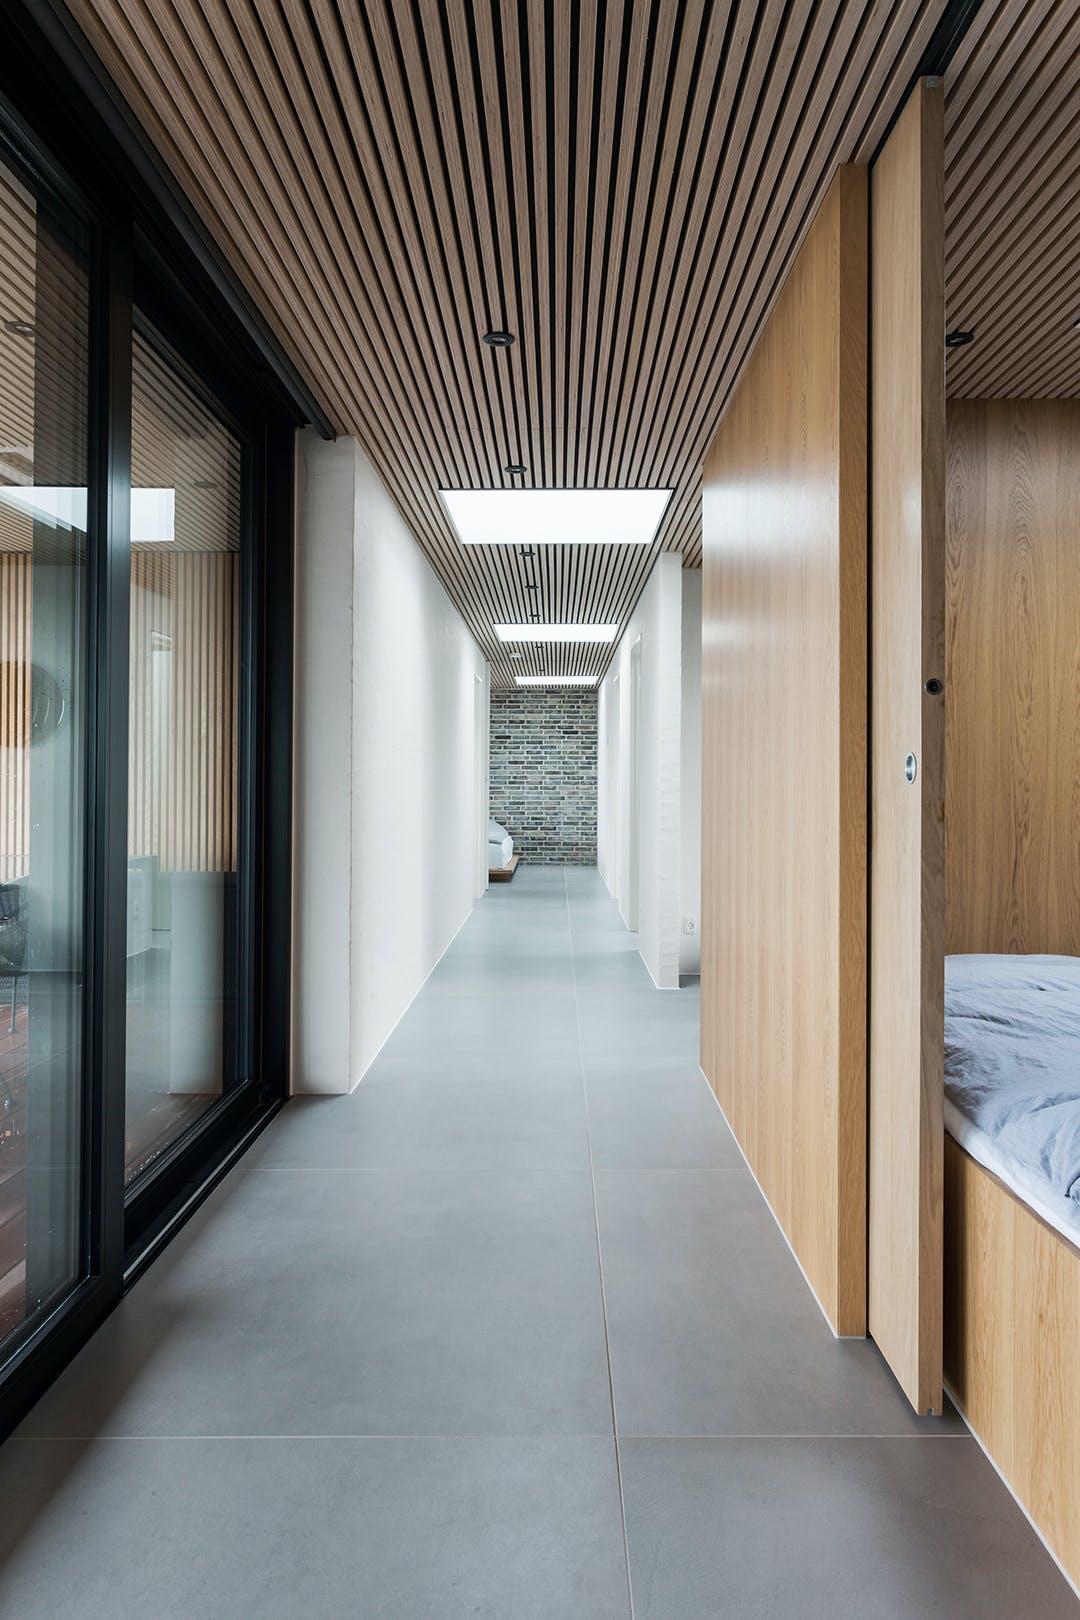 Sommerhus ovenlys trælameller loft